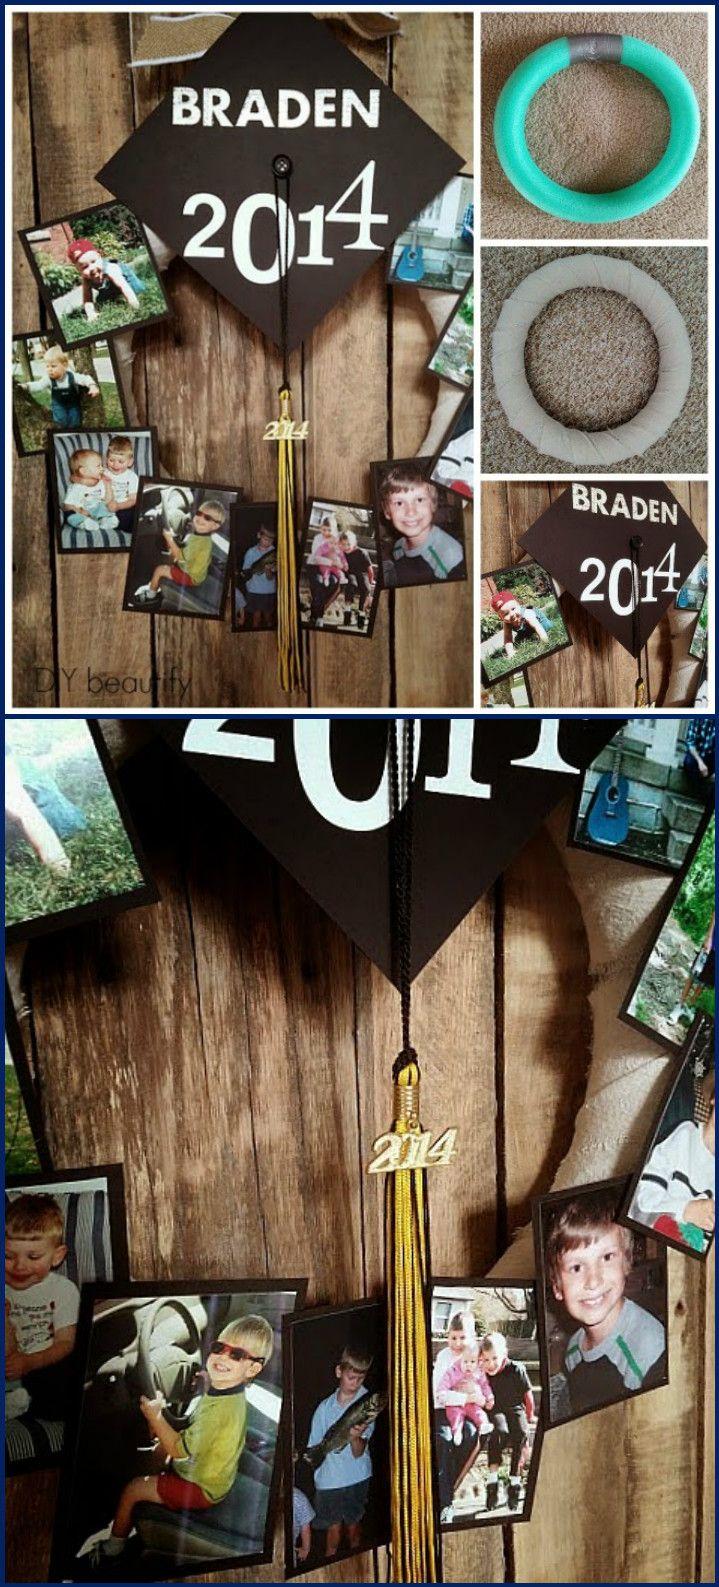 2014 graduation decorations - 50 Diy Graduation Party Ideas Decorations Page 3 Of 4